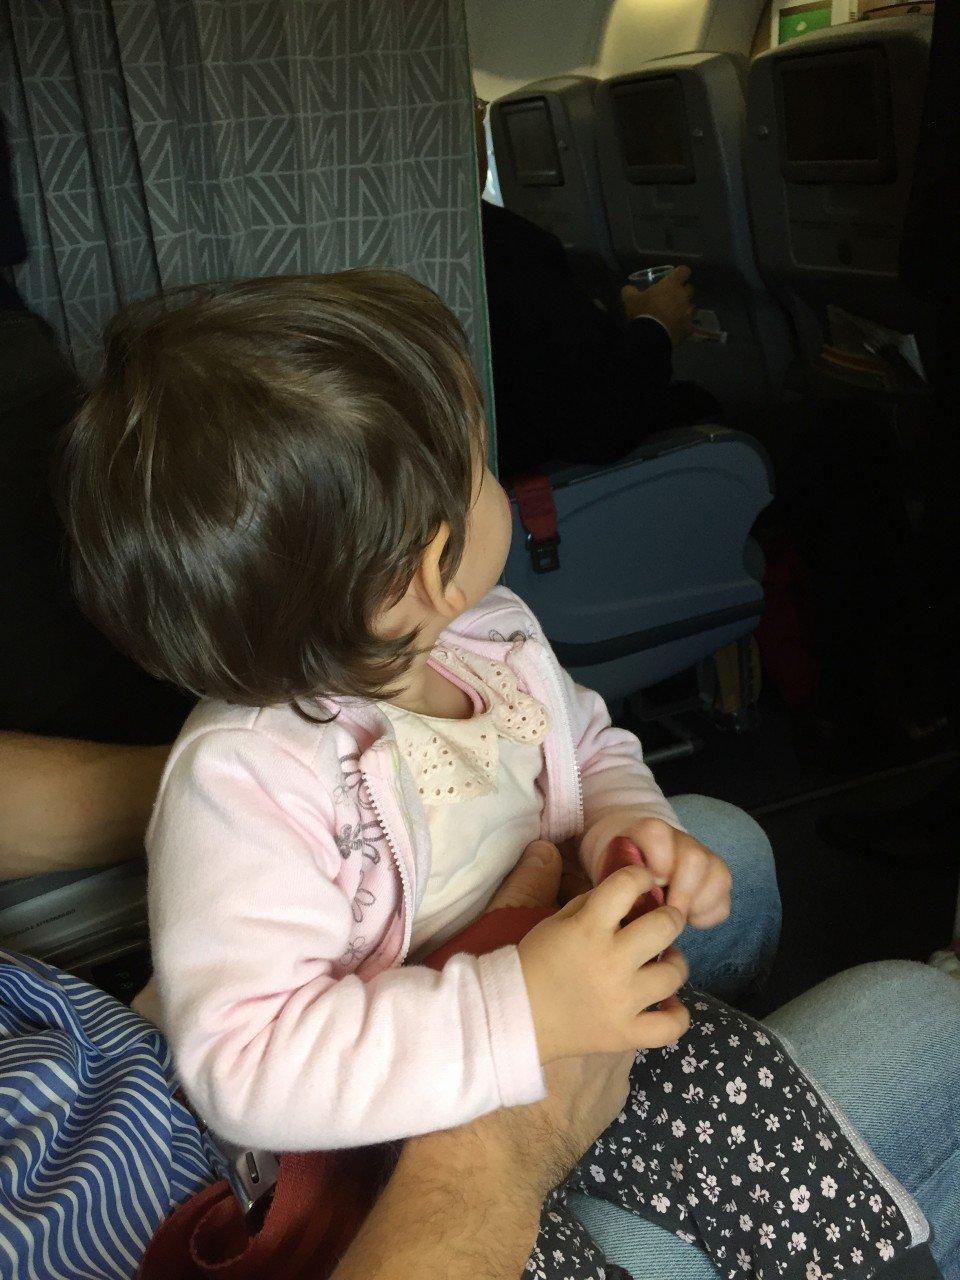 bimbi aereo, neonati e aereo